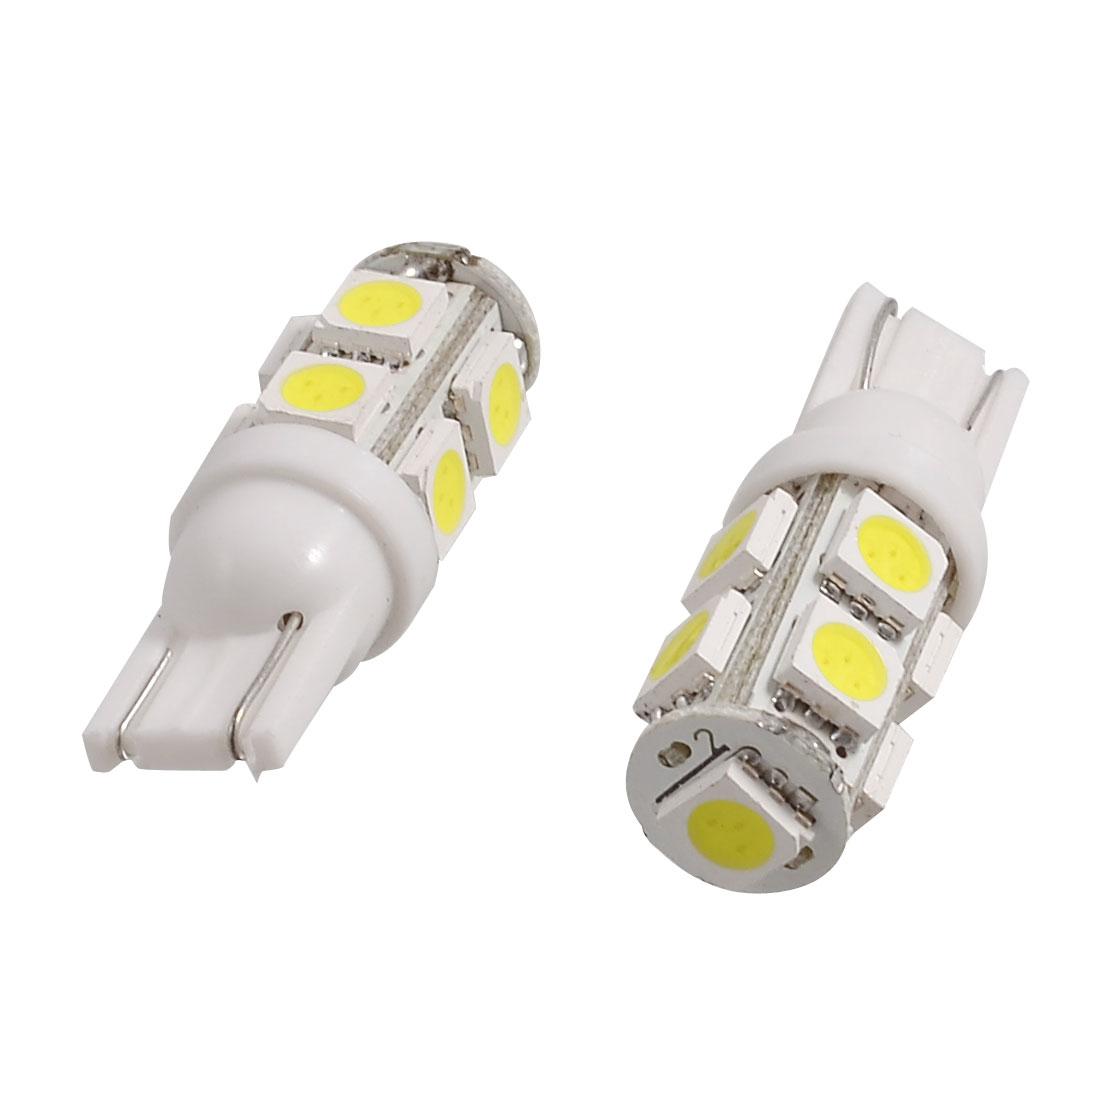 2 Pcs Car T10 W5W 9 5050 SMD LED White Lamp Side Wedge Light Bulbs